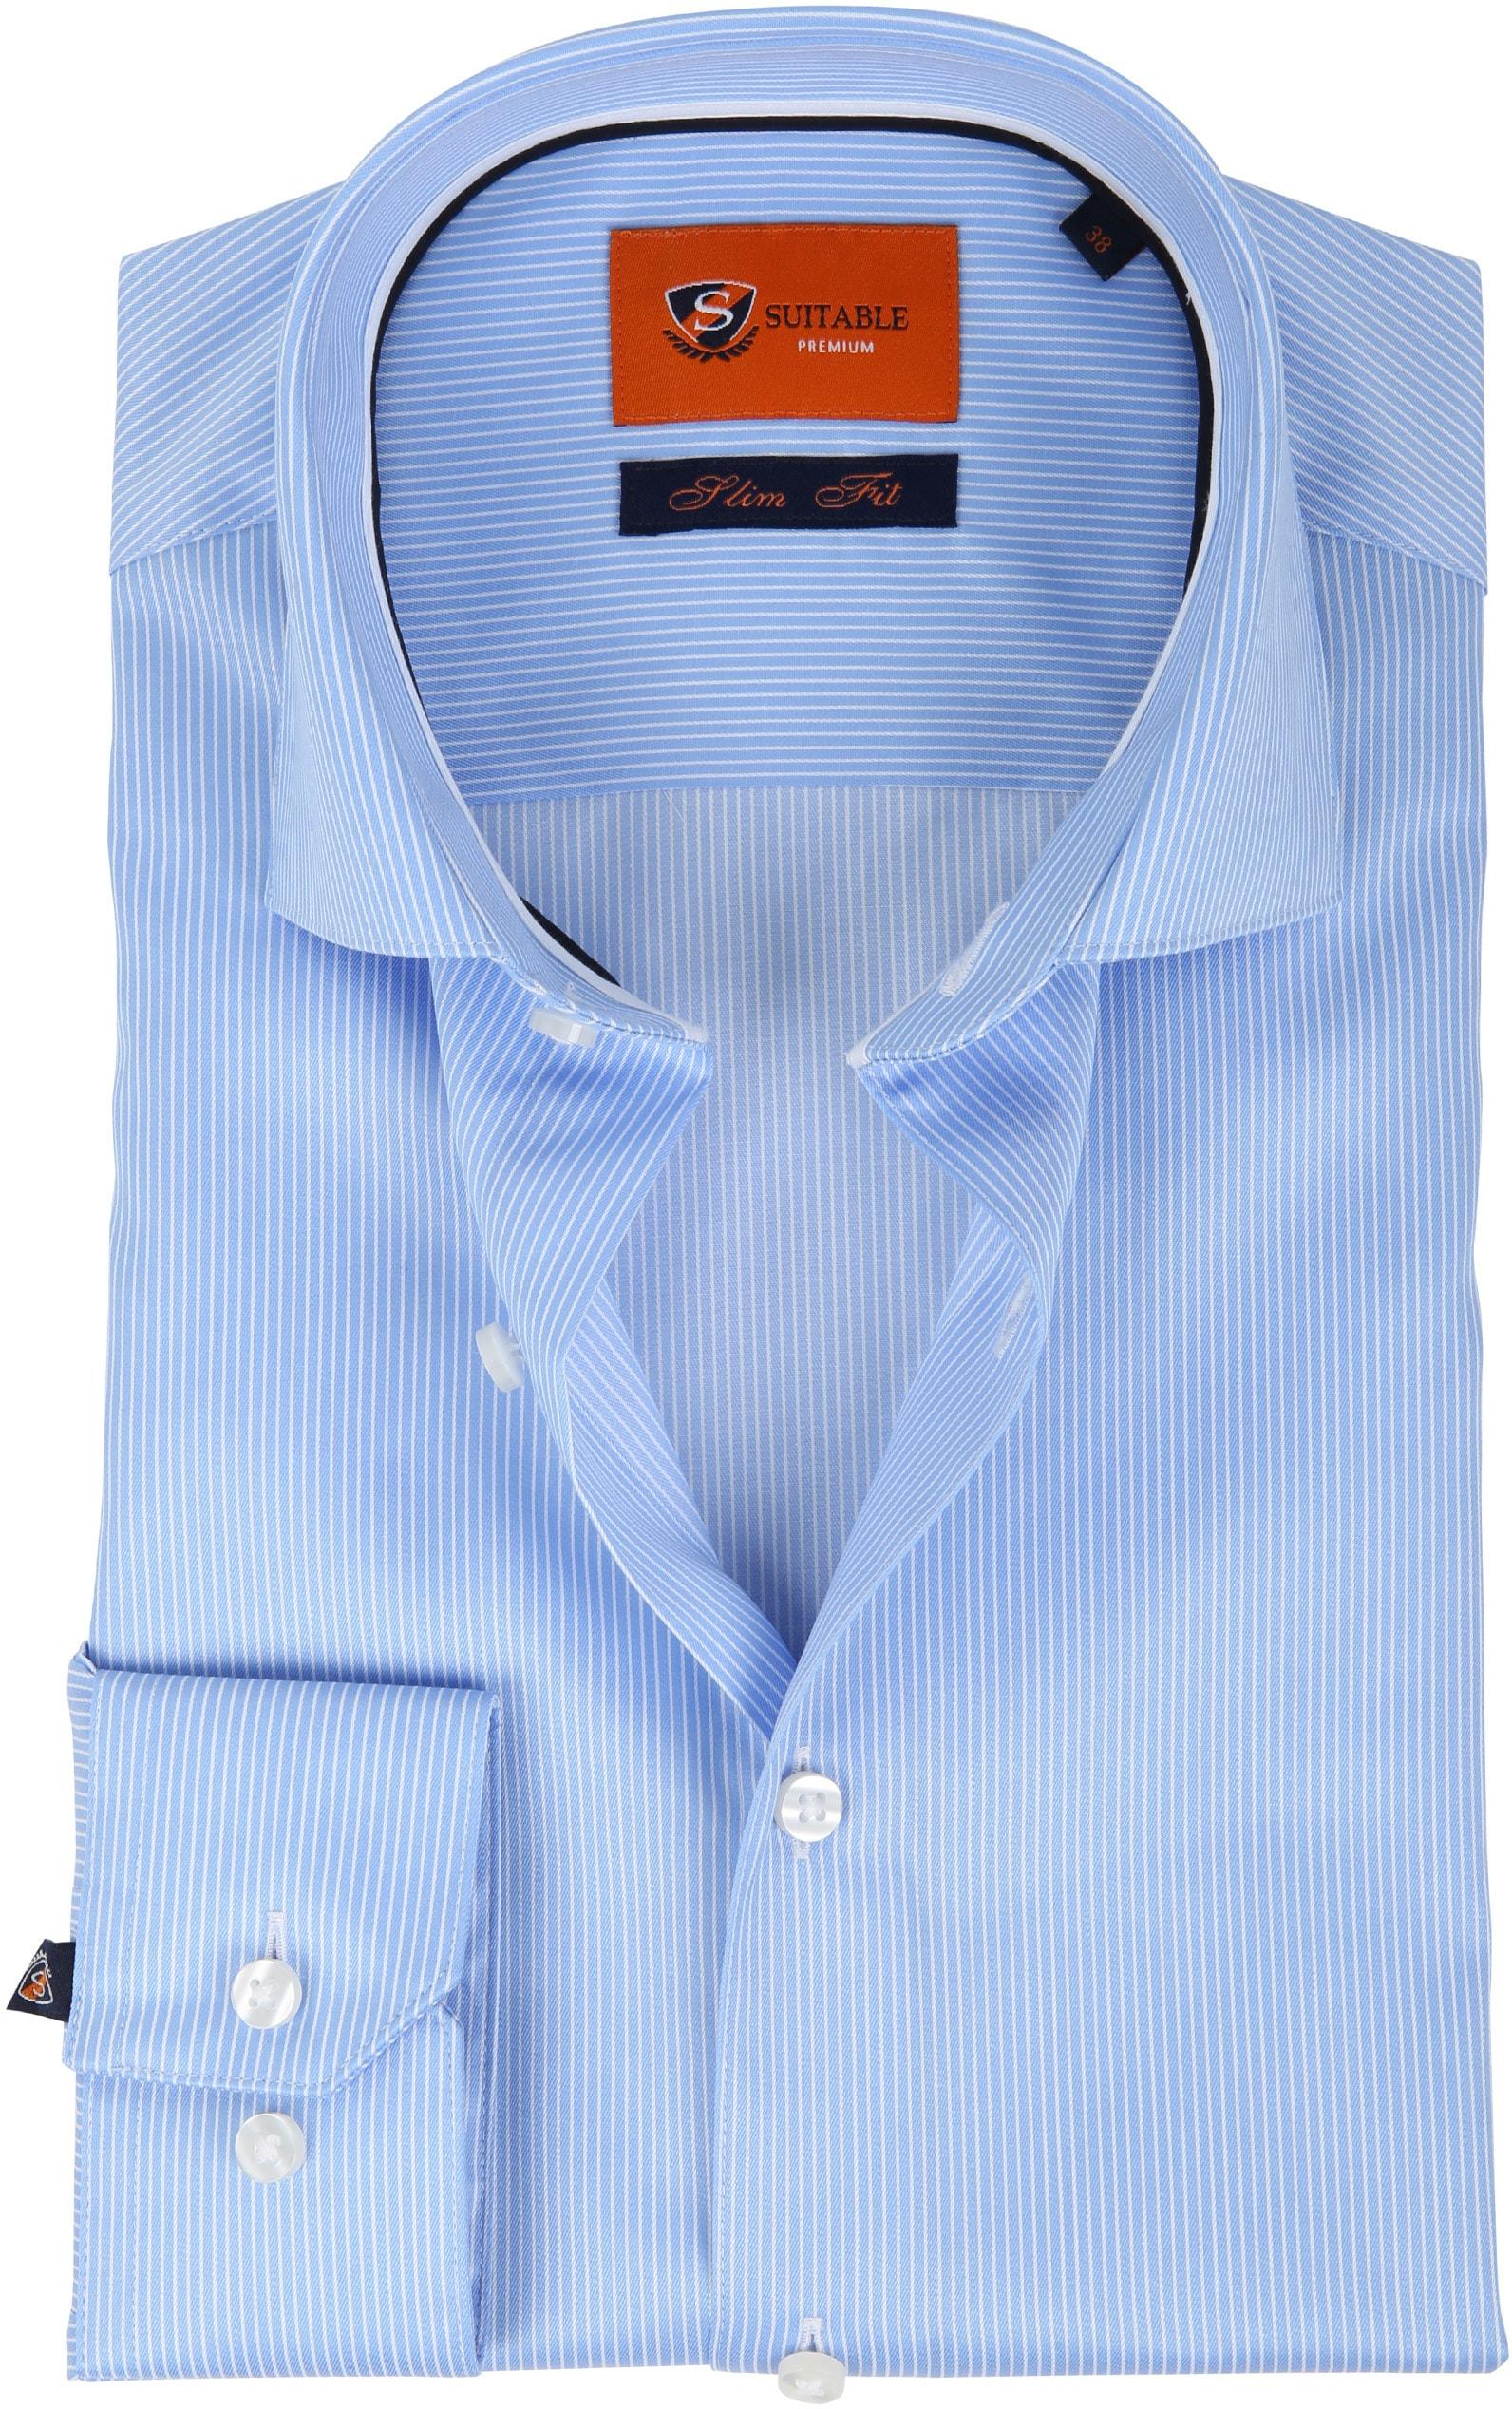 Suitable Hemd Blau Streifen D81-10 foto 0